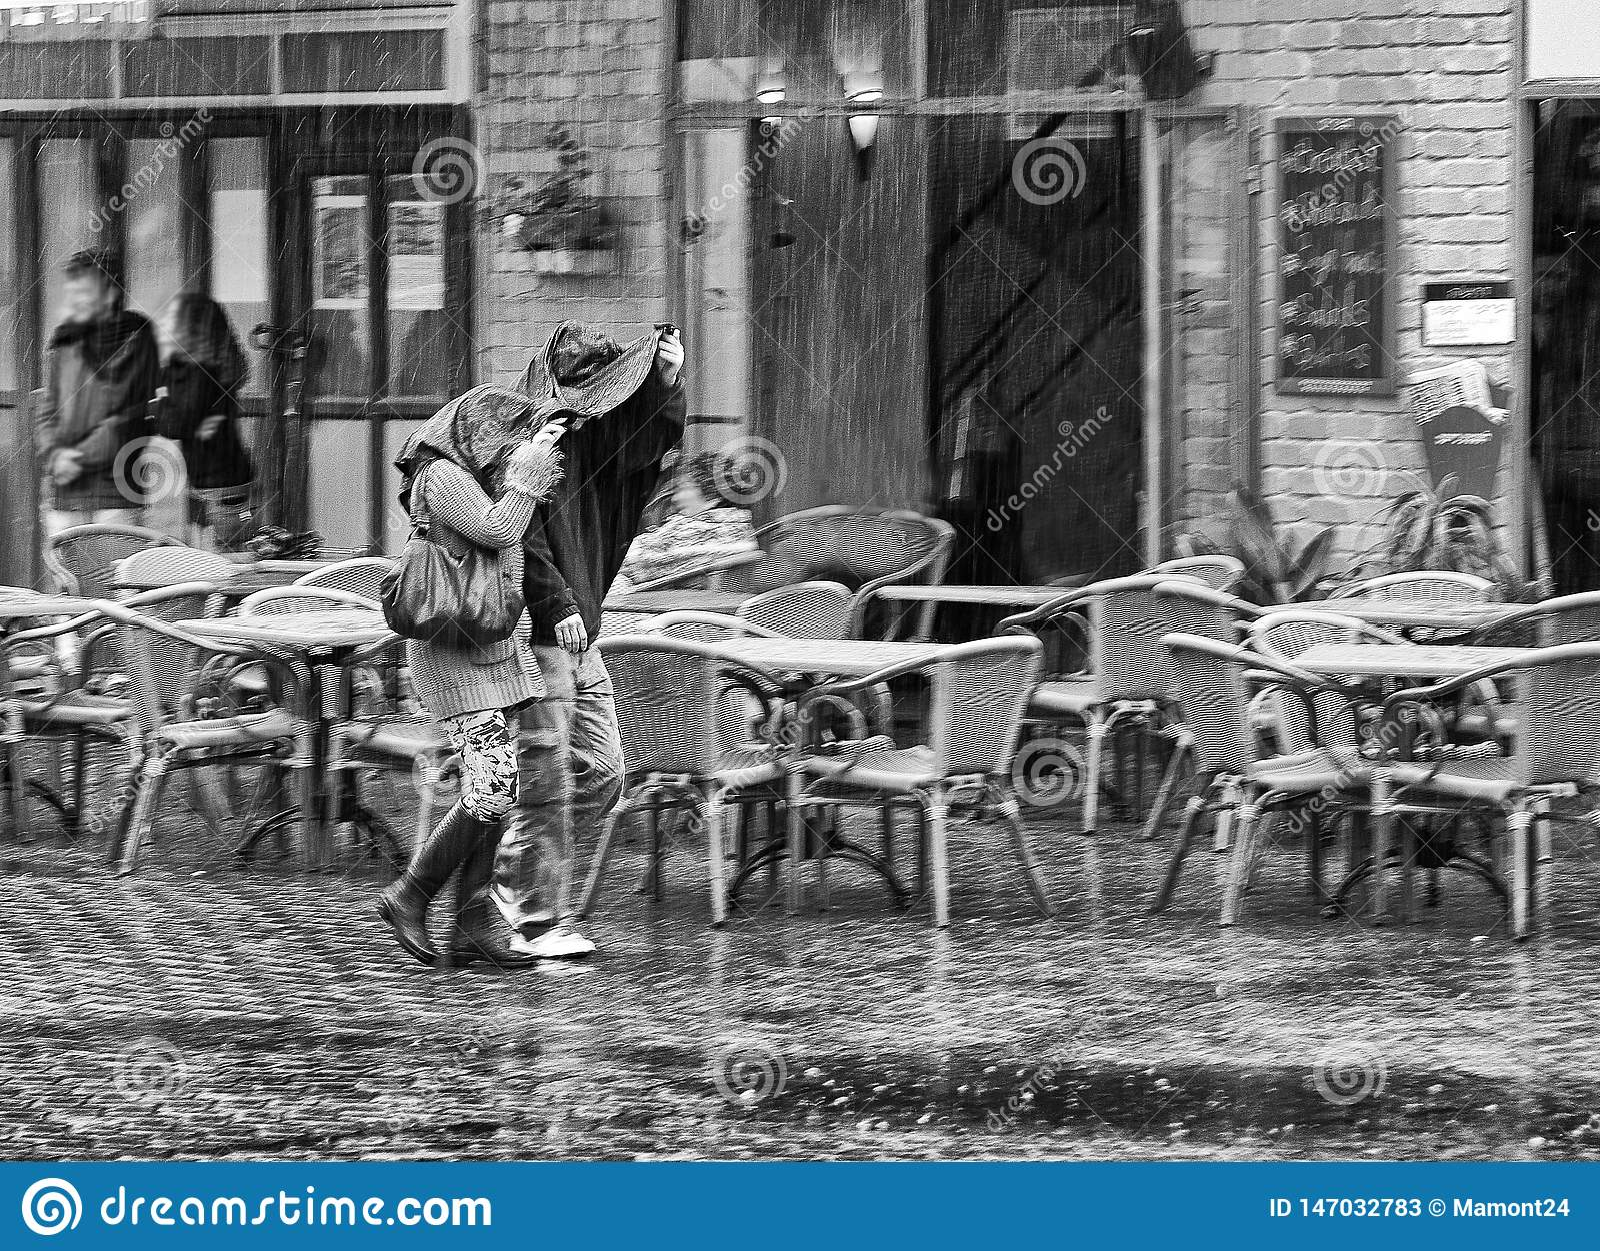 Two in the rain. B & W.